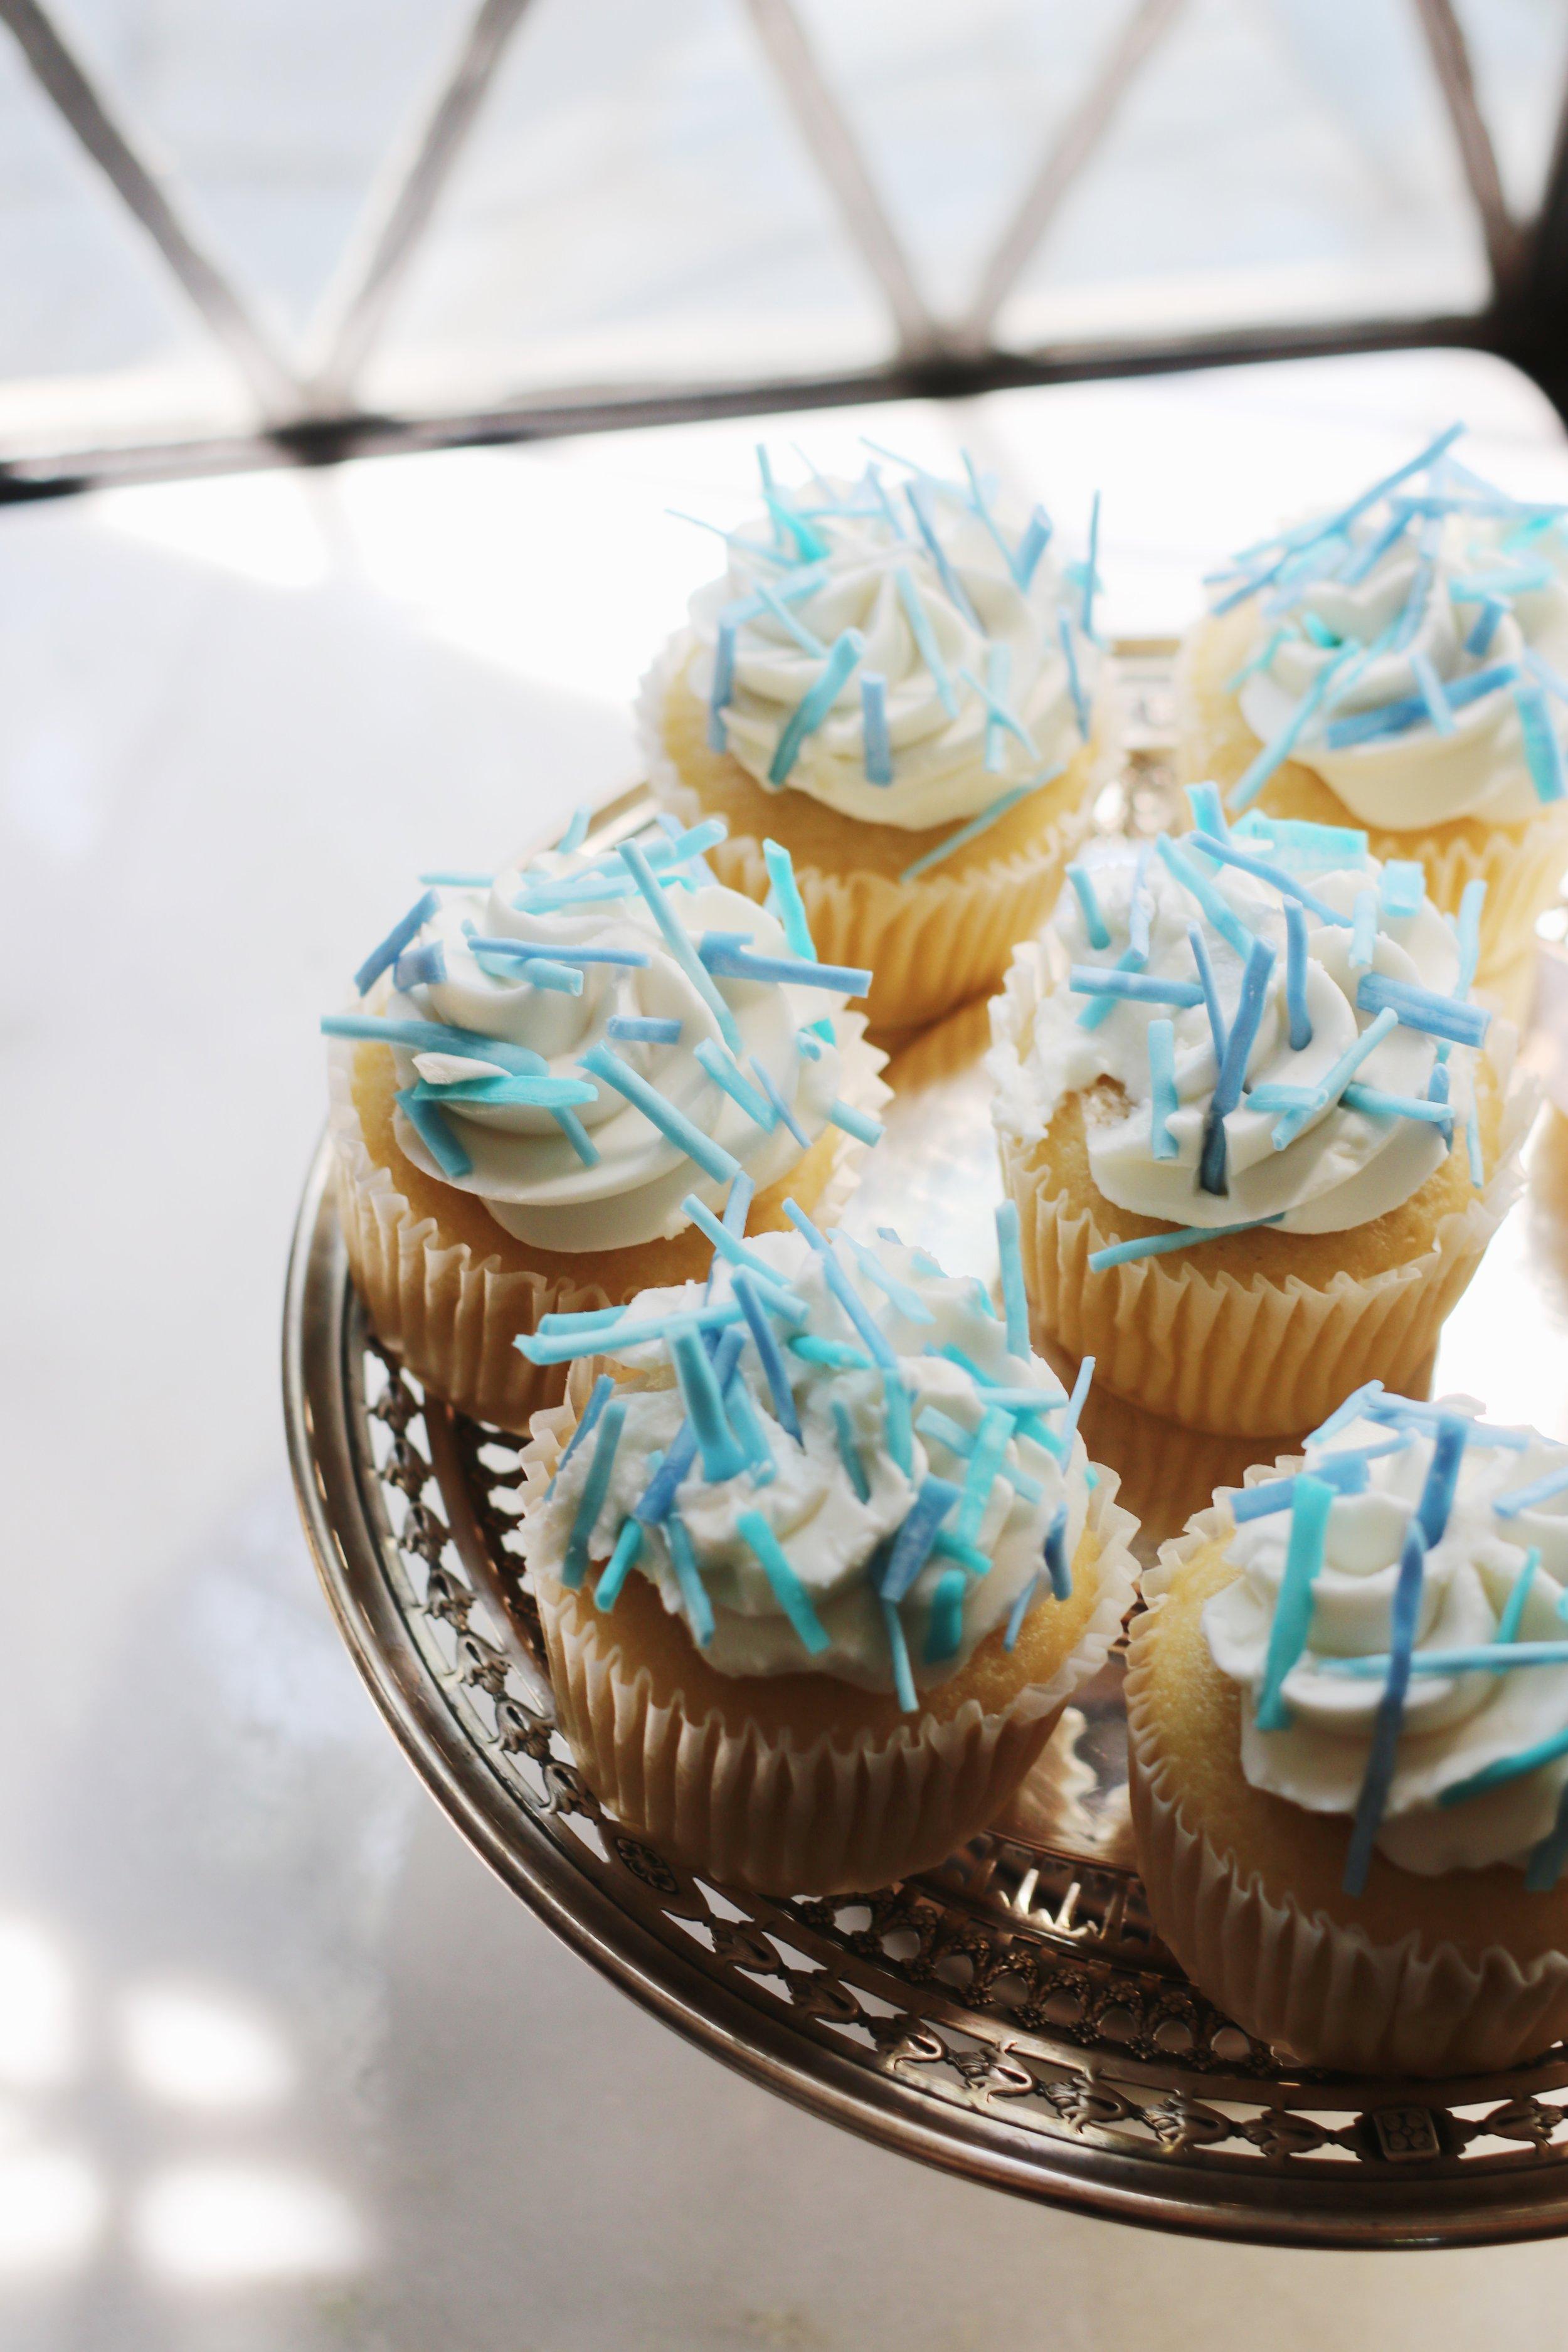 hanukkah-cupcakes-homemade-sprinkles-recipe-22.JPG